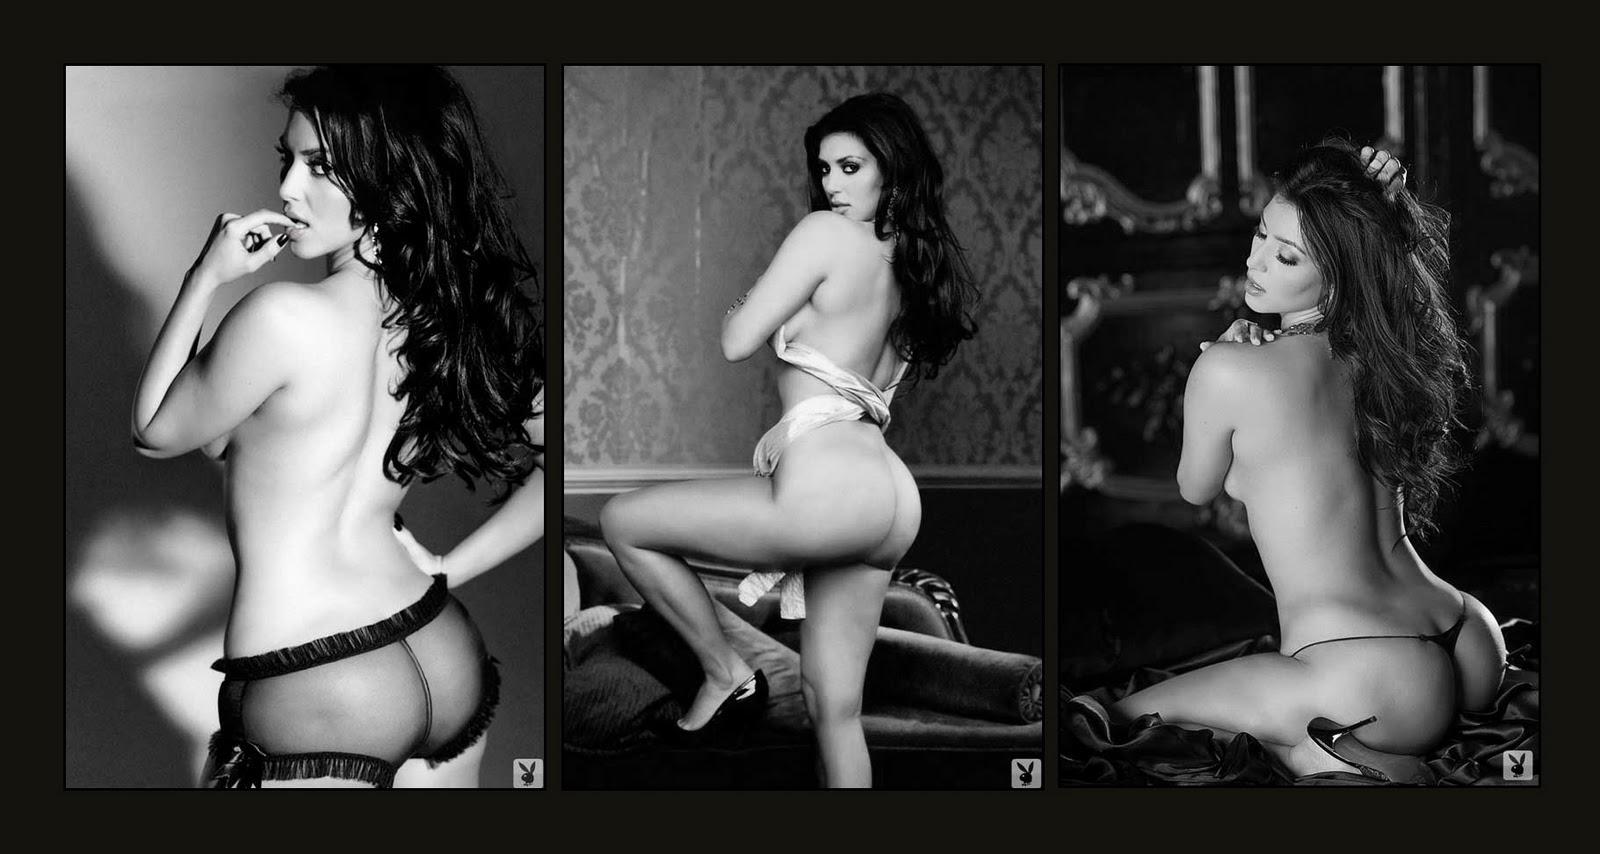 http://1.bp.blogspot.com/-KfzBa09oiD8/TZAM1qhfMHI/AAAAAAAACCY/It2vnTMtKmc/s1600/kim+kardashian+playboyX3.jpg